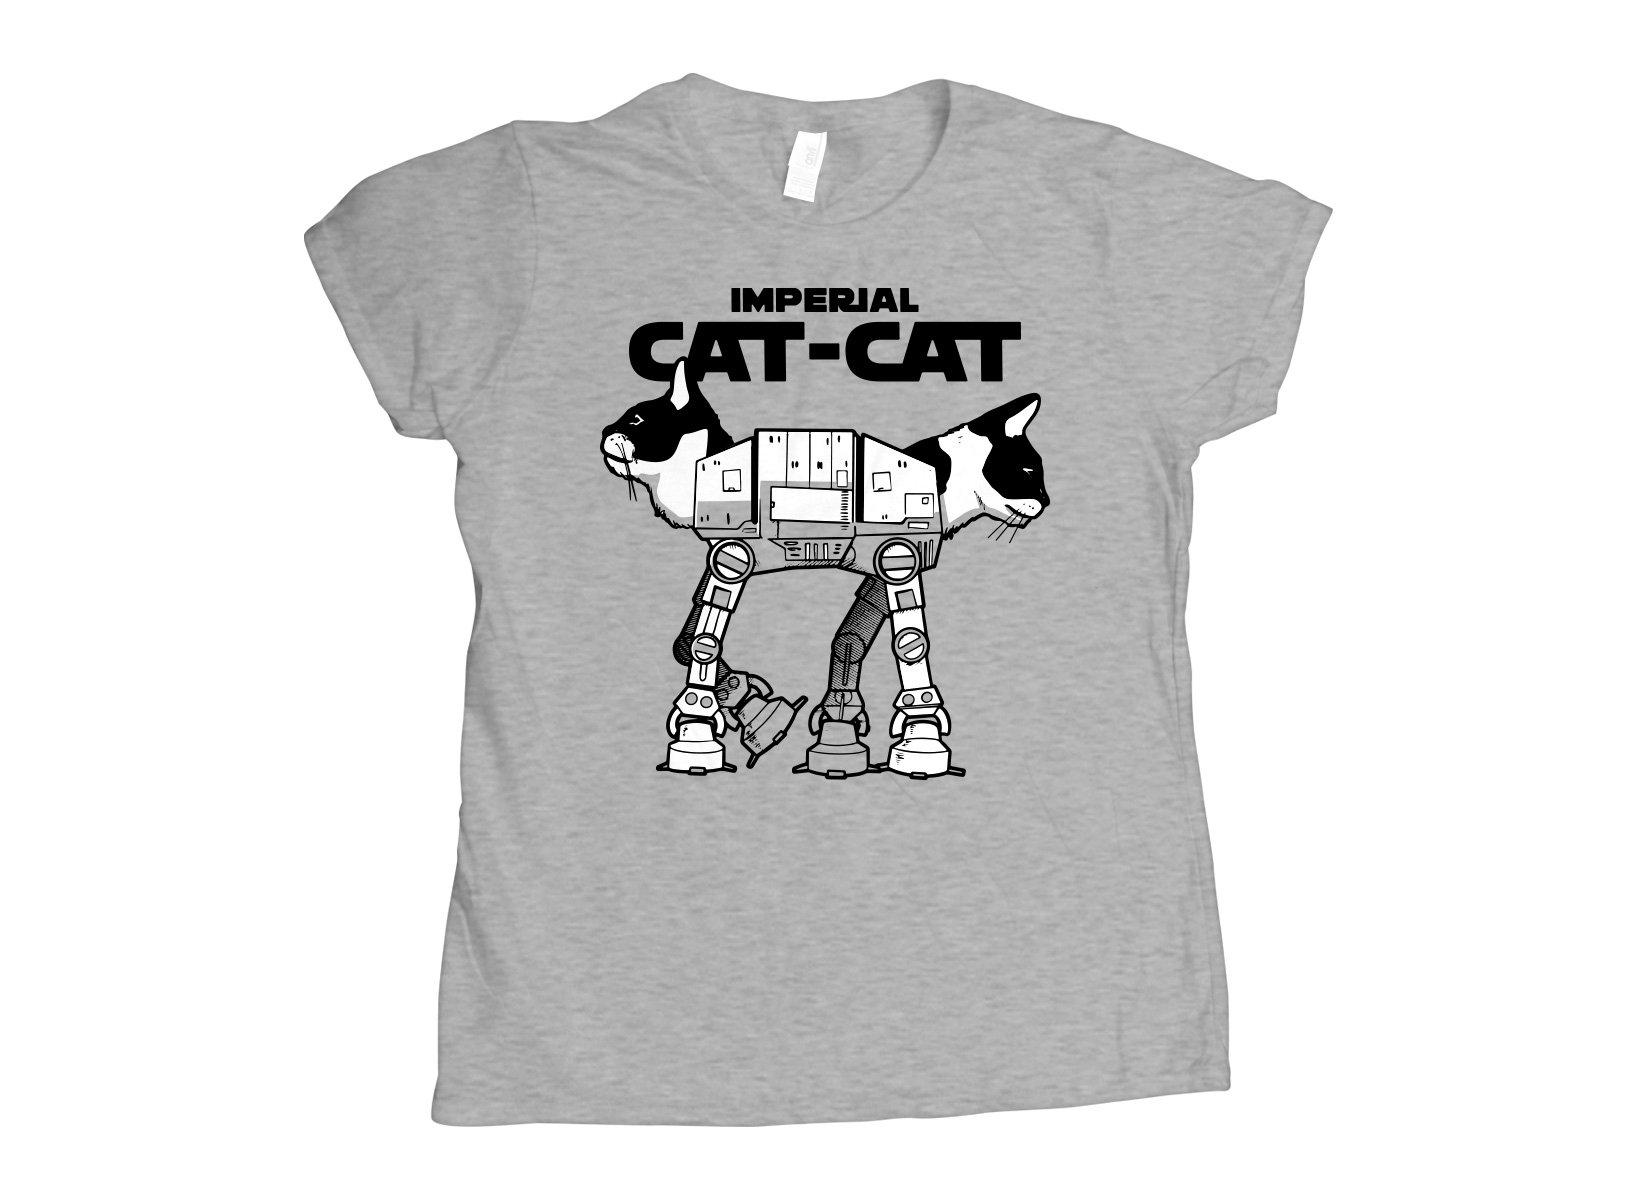 Cat-Cat on Womens T-Shirt